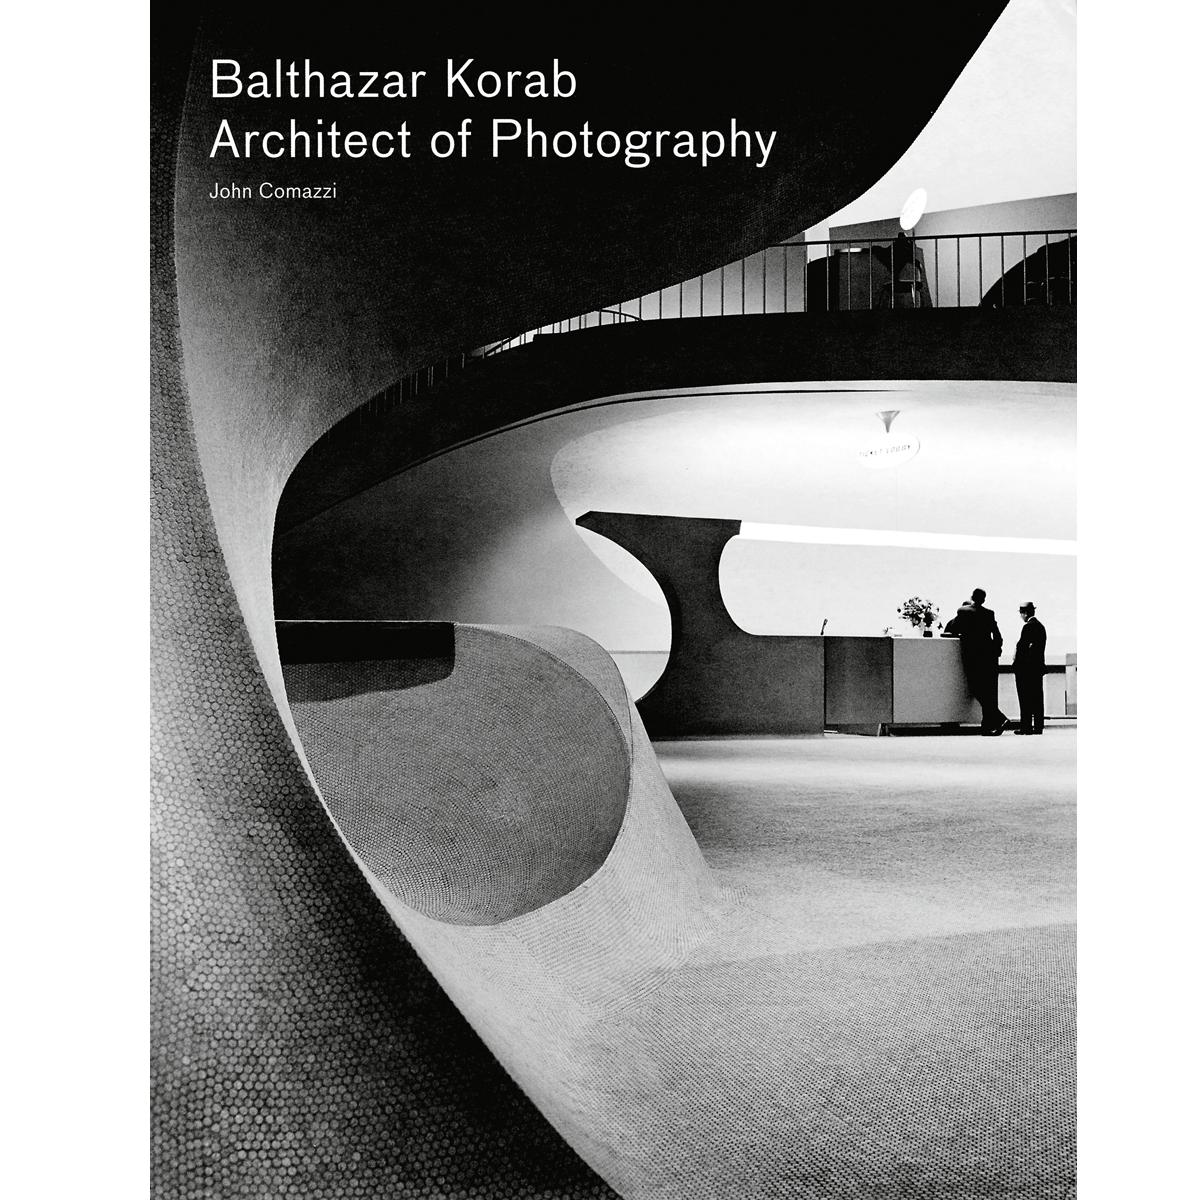 Balthazar Korab